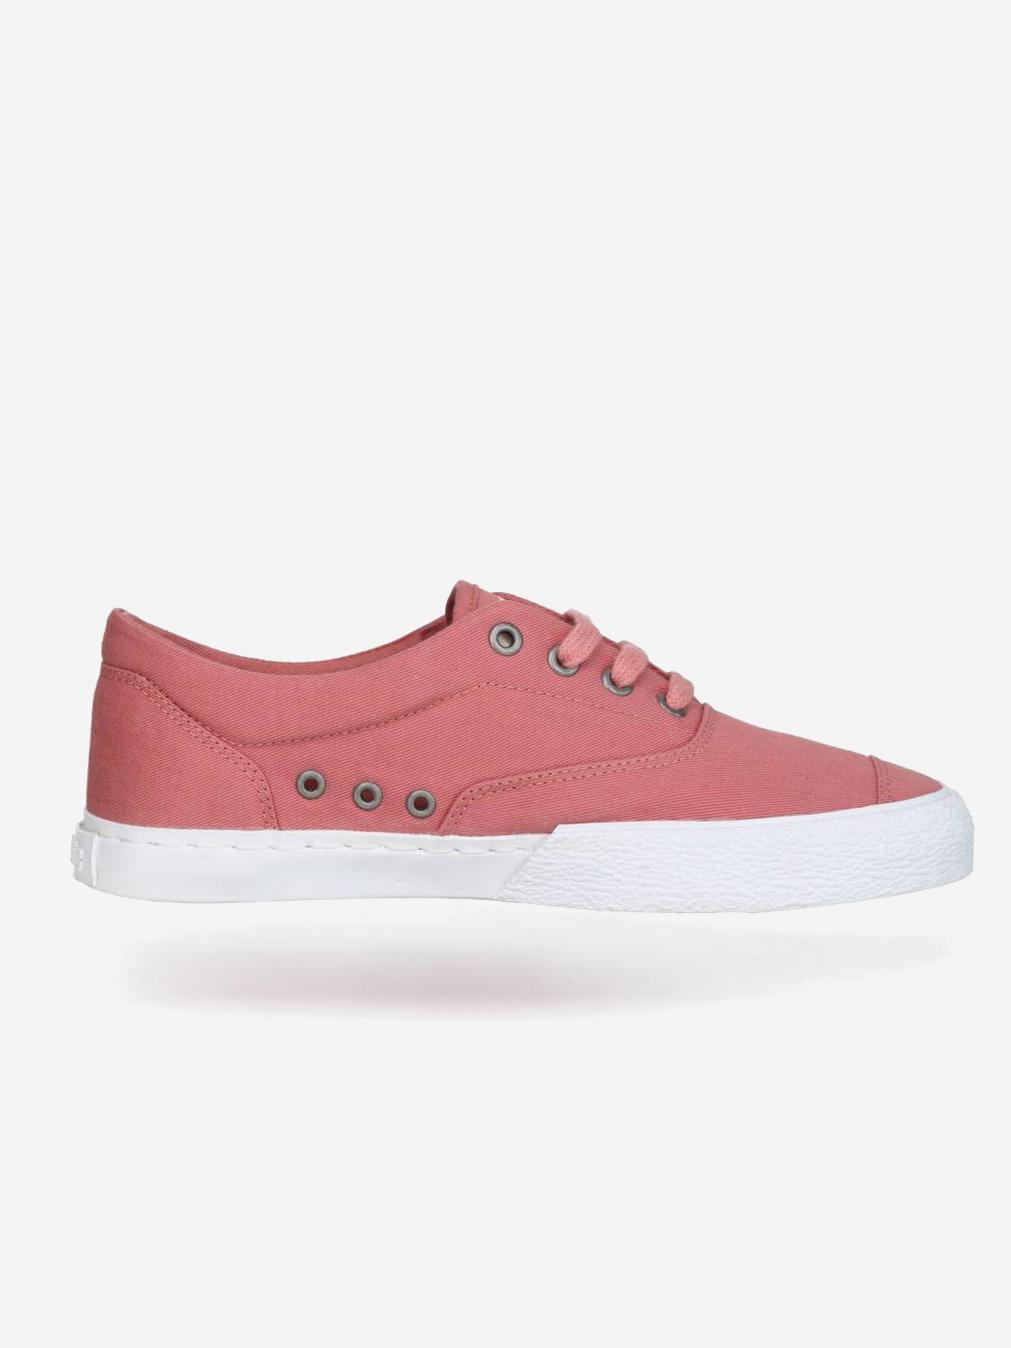 Vegan-Shoes-Ethletic